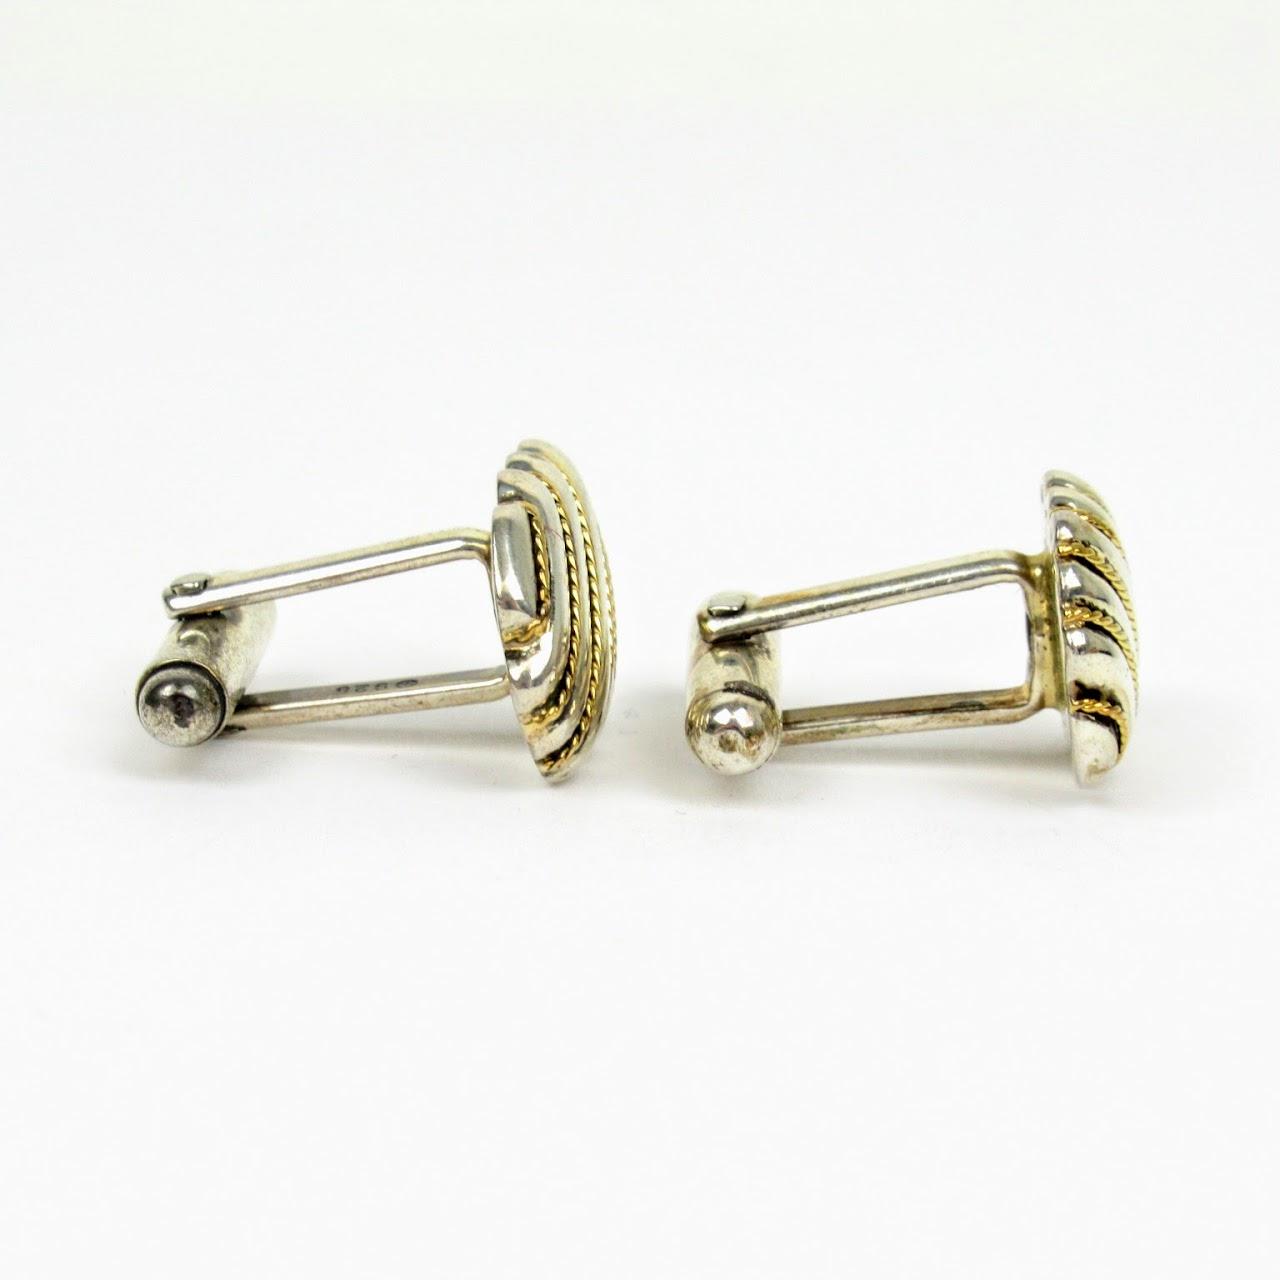 Tiffany & Co.Sterling Silver & 18K Gold Cufflinks